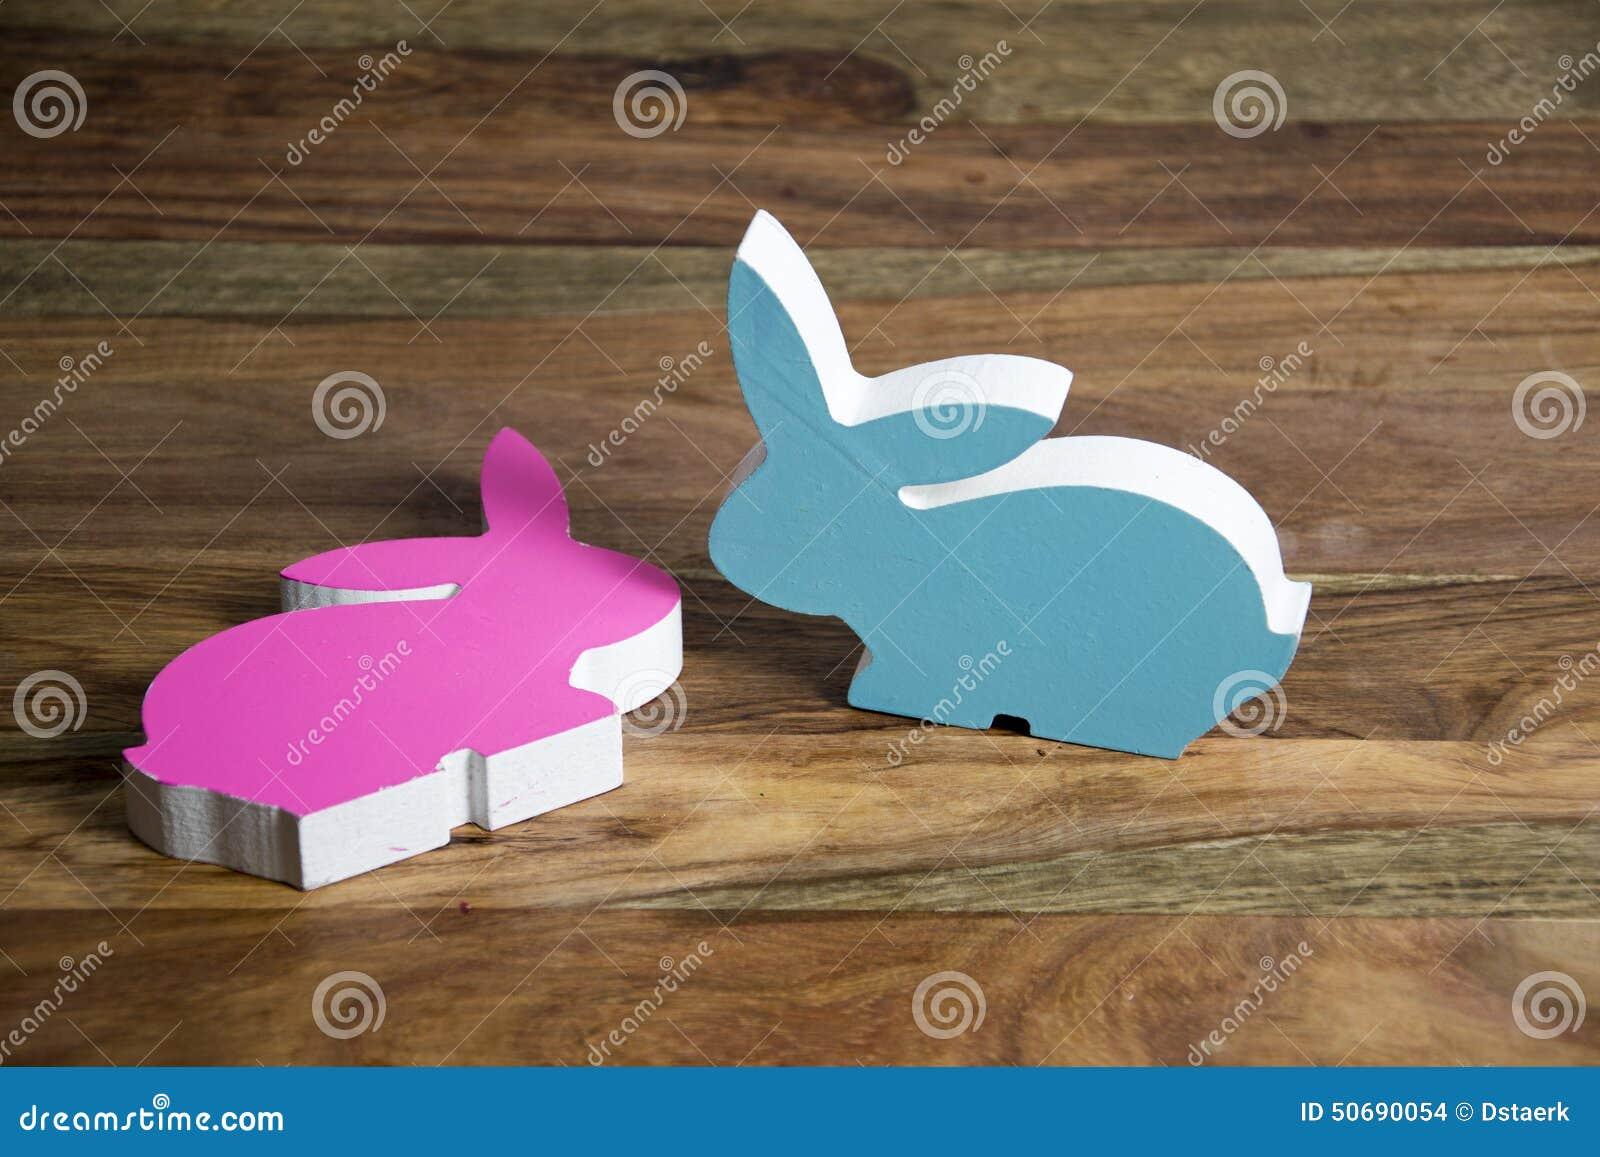 Download 复活节 库存照片. 图片 包括有 传统, 兔子, 节假日, 空白, 季节, 符号, 春天, 概念, 庆祝 - 50690054